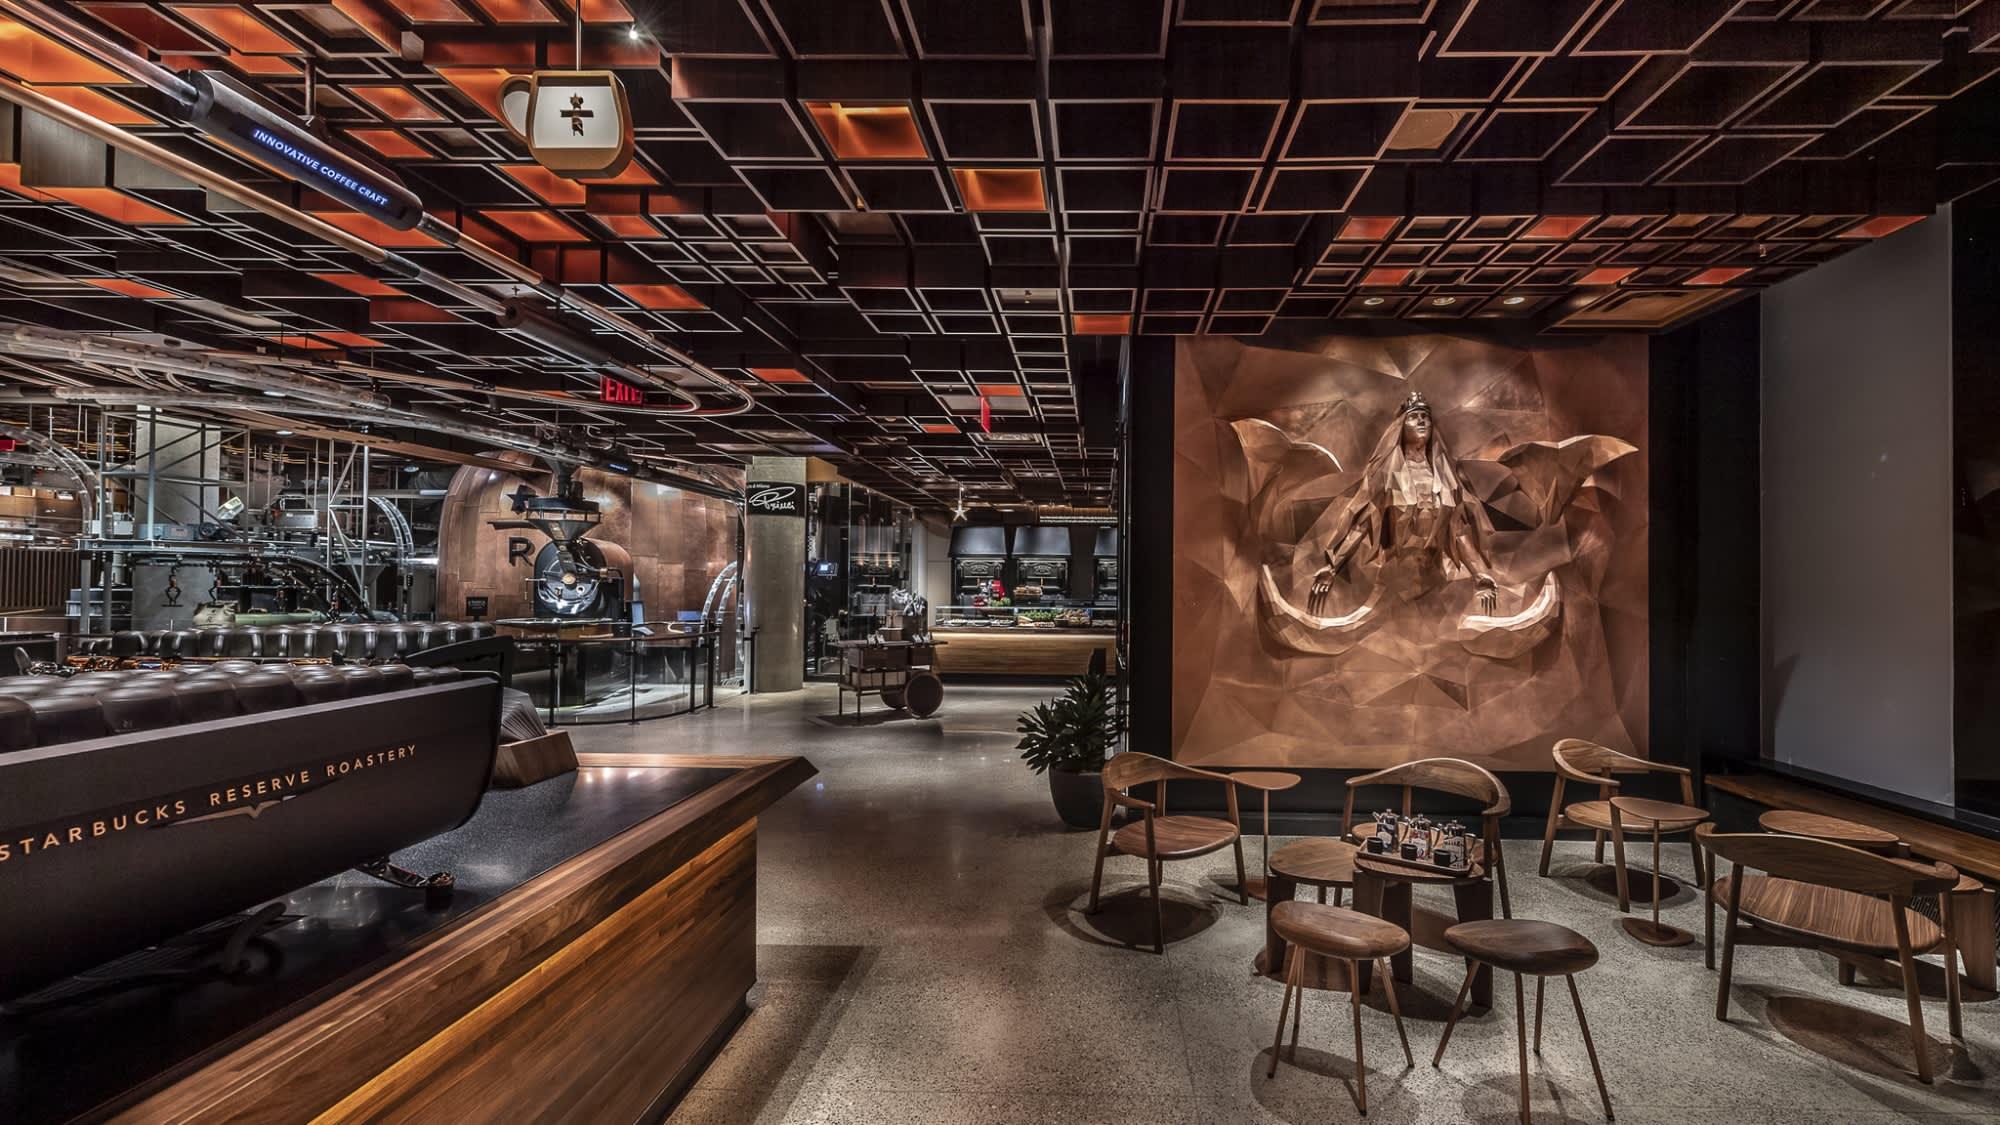 Here S What Starbucks New Roastery In New York City Looks Like